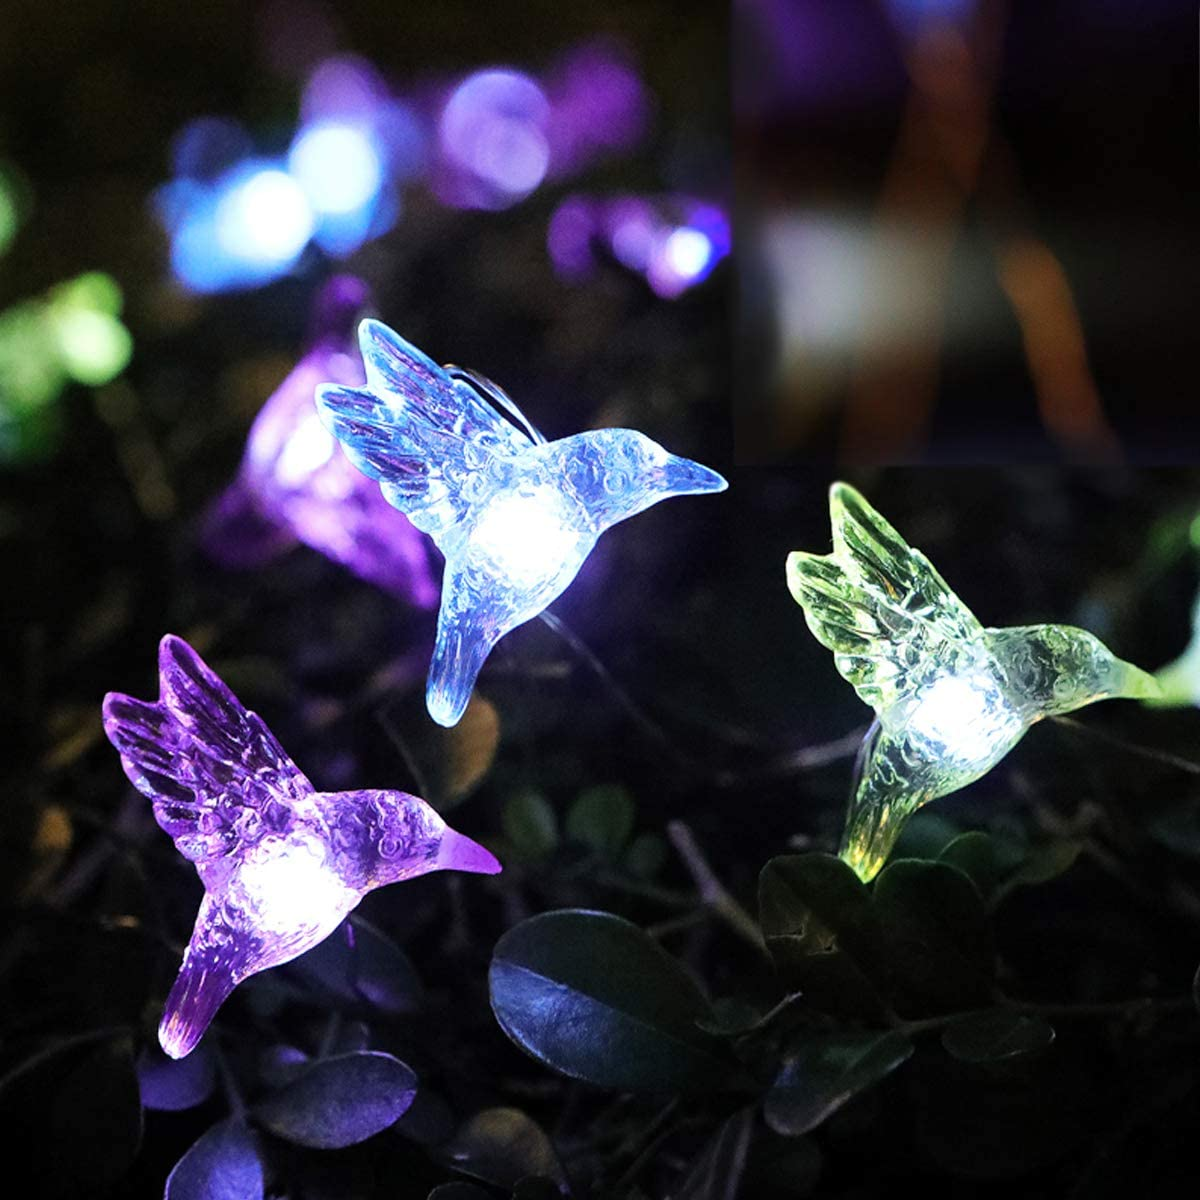 WSgift Solar Hummingbird String Lights, 15.8 Ft 30 Warm White LED Outdoor Waterproof Bird Fairy String Lights for Garden Yard Outdoor Decorations